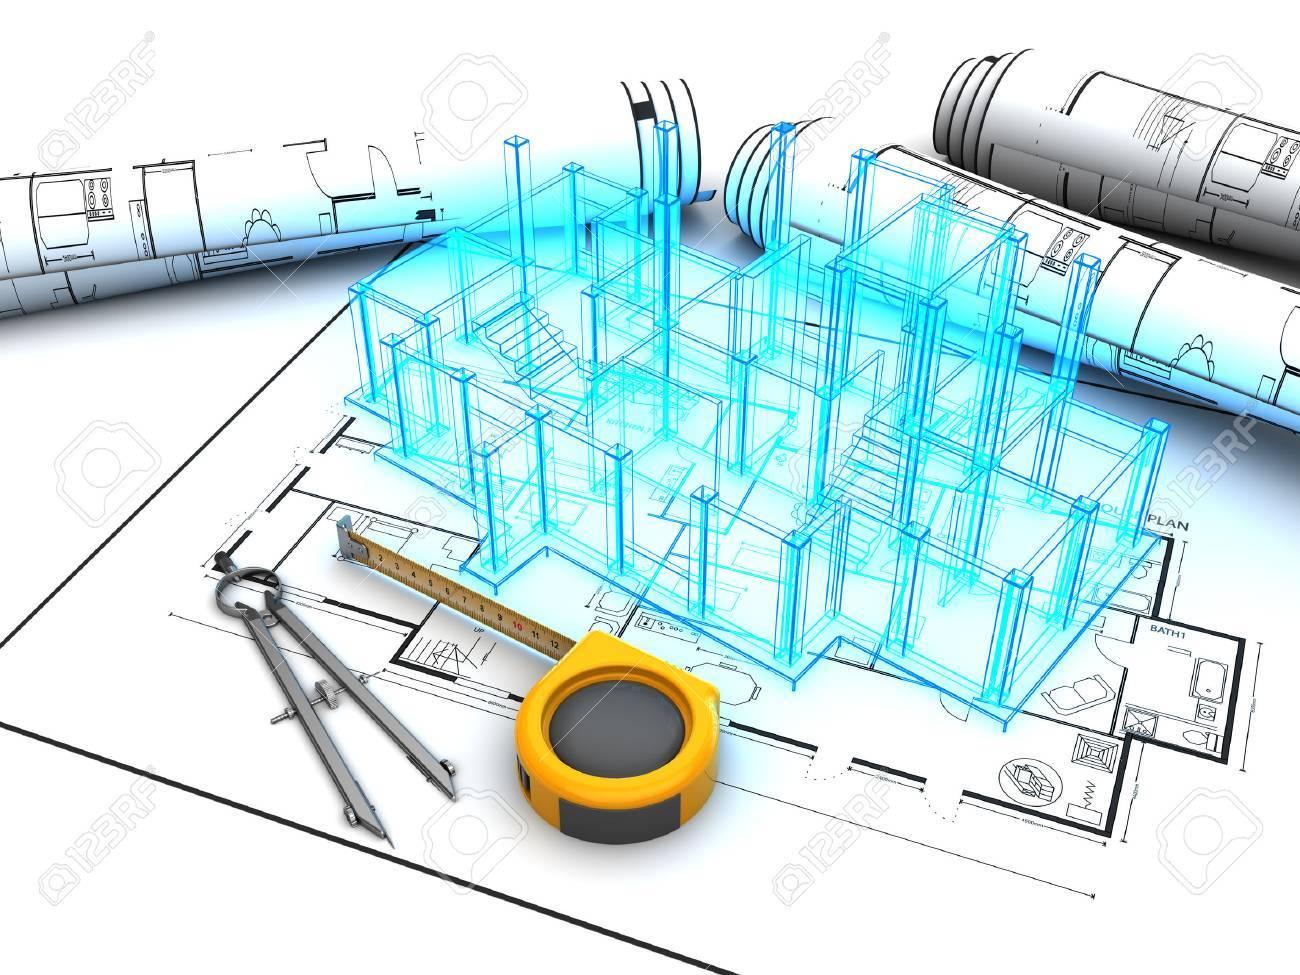 3d illustration of building design project - 61546491